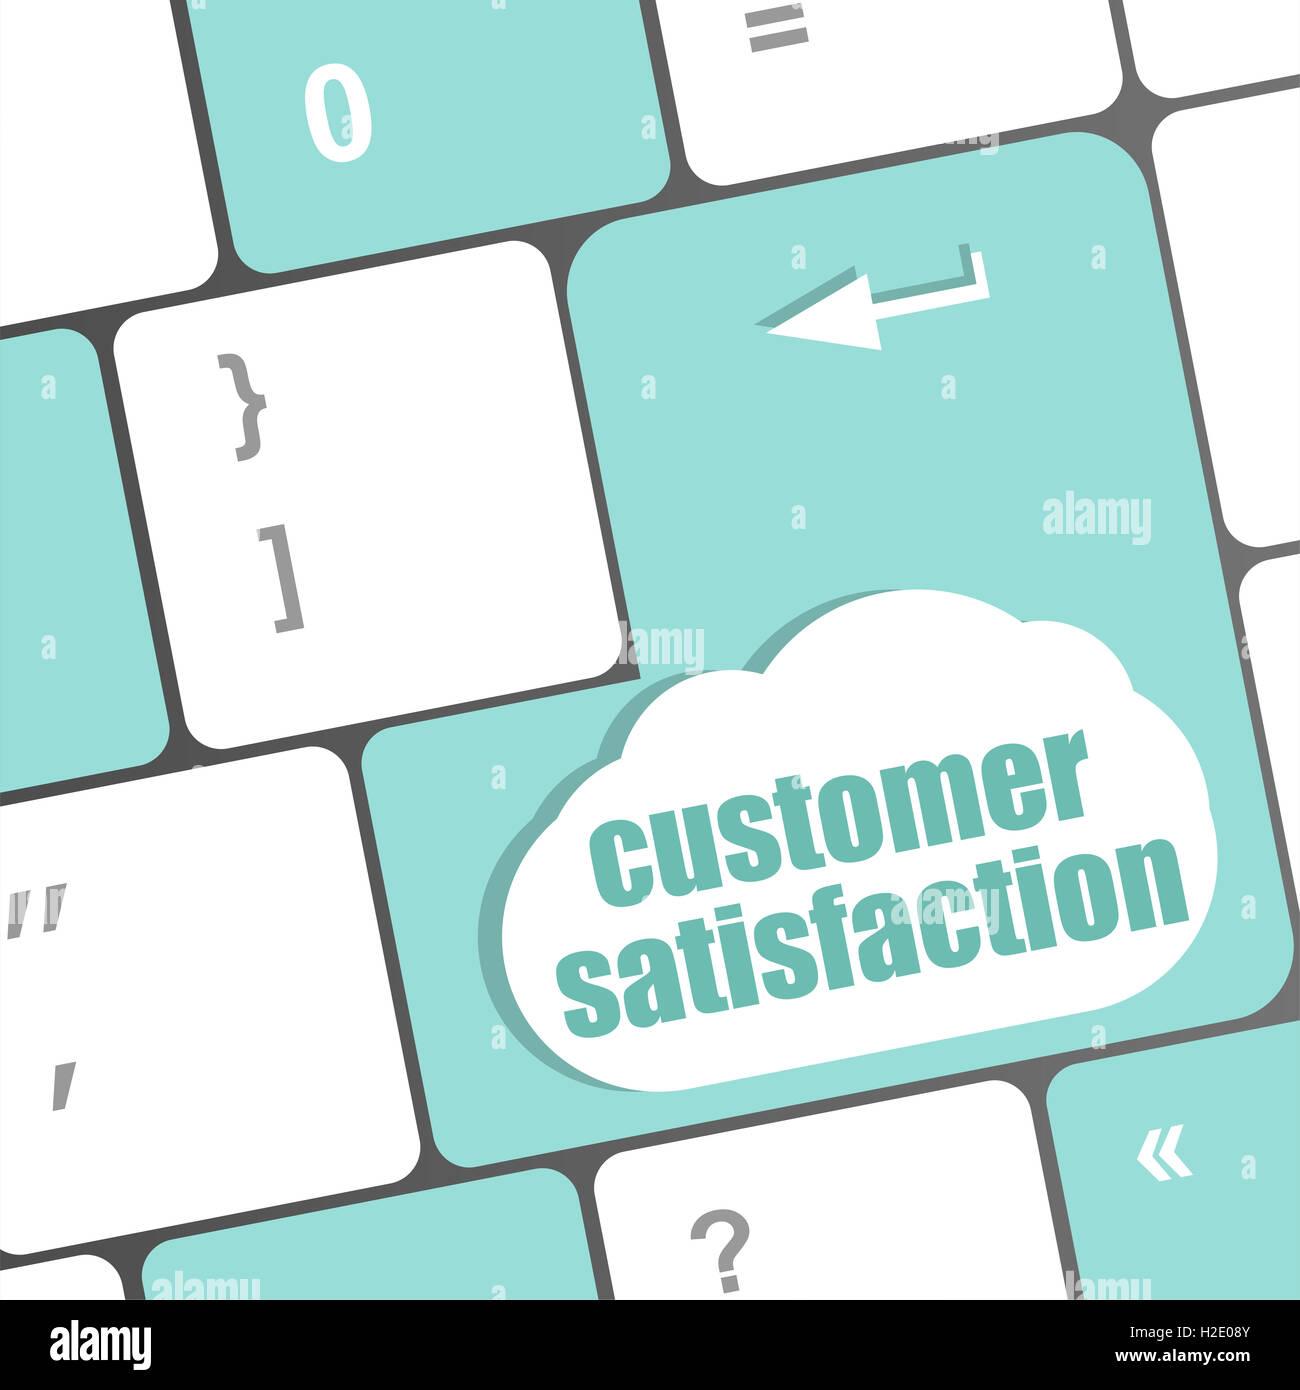 customer satisfaction key word on computer keyboard - Stock Image